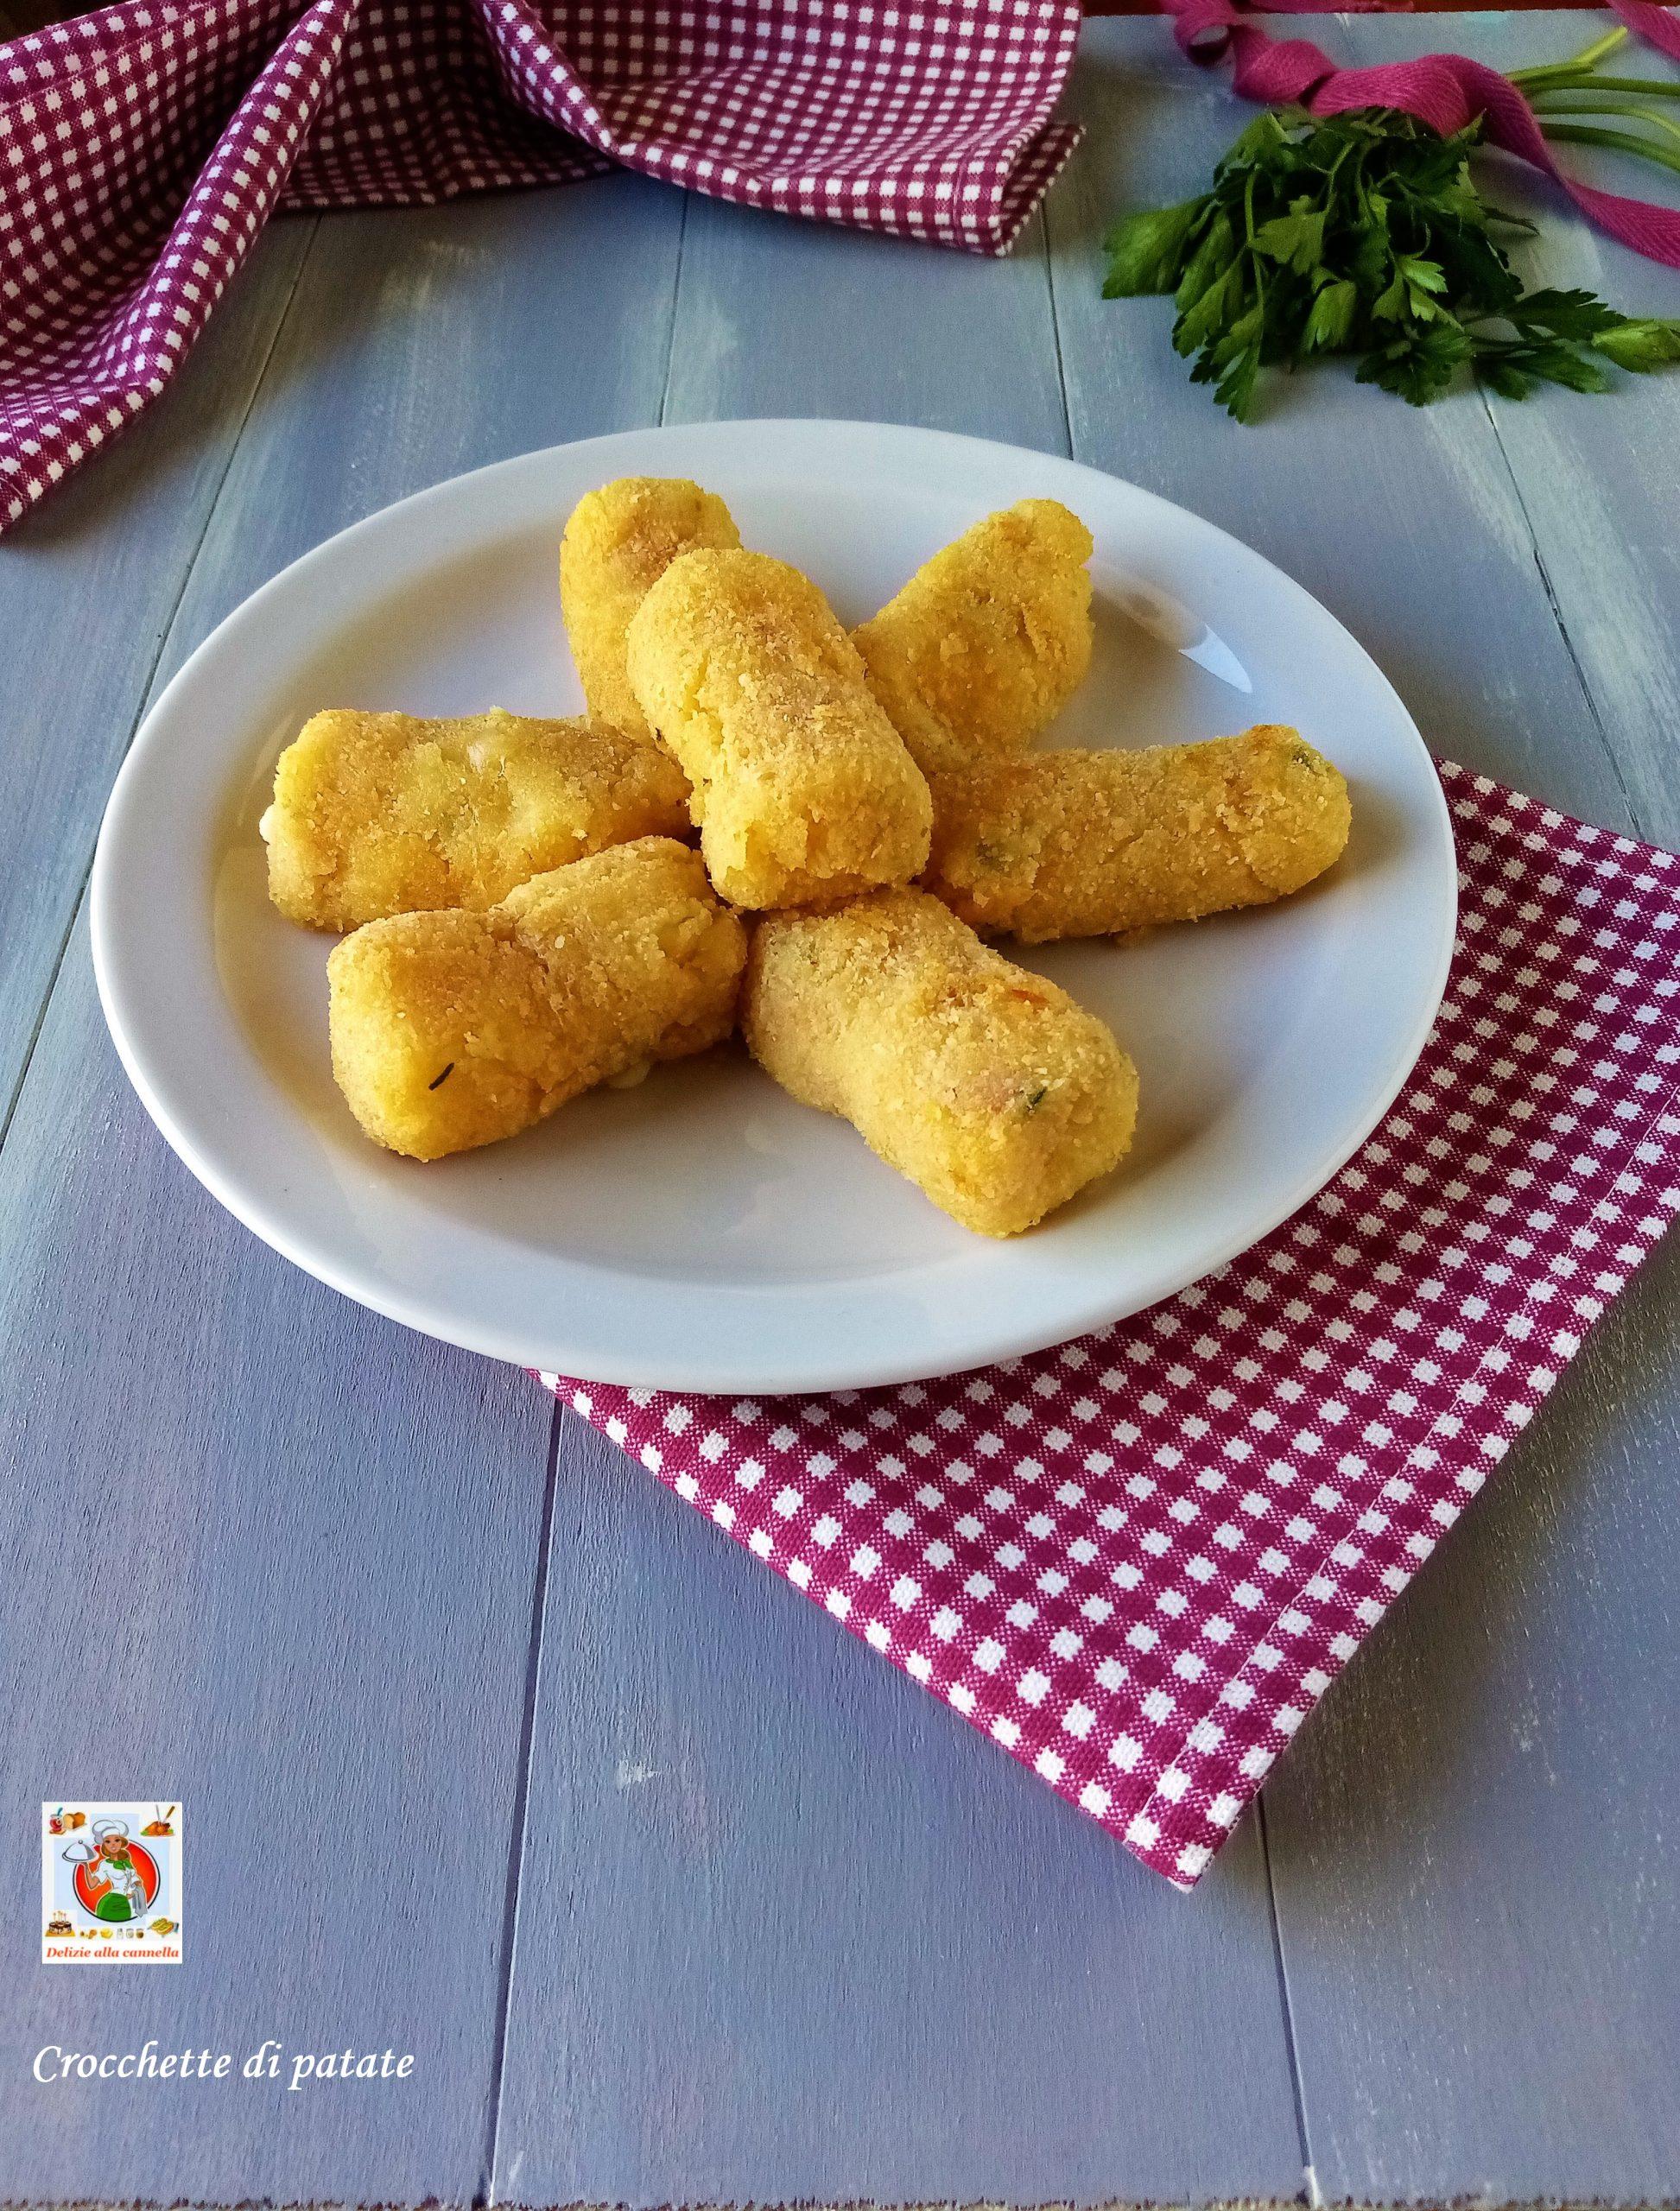 crocchette di patate ricetta v1